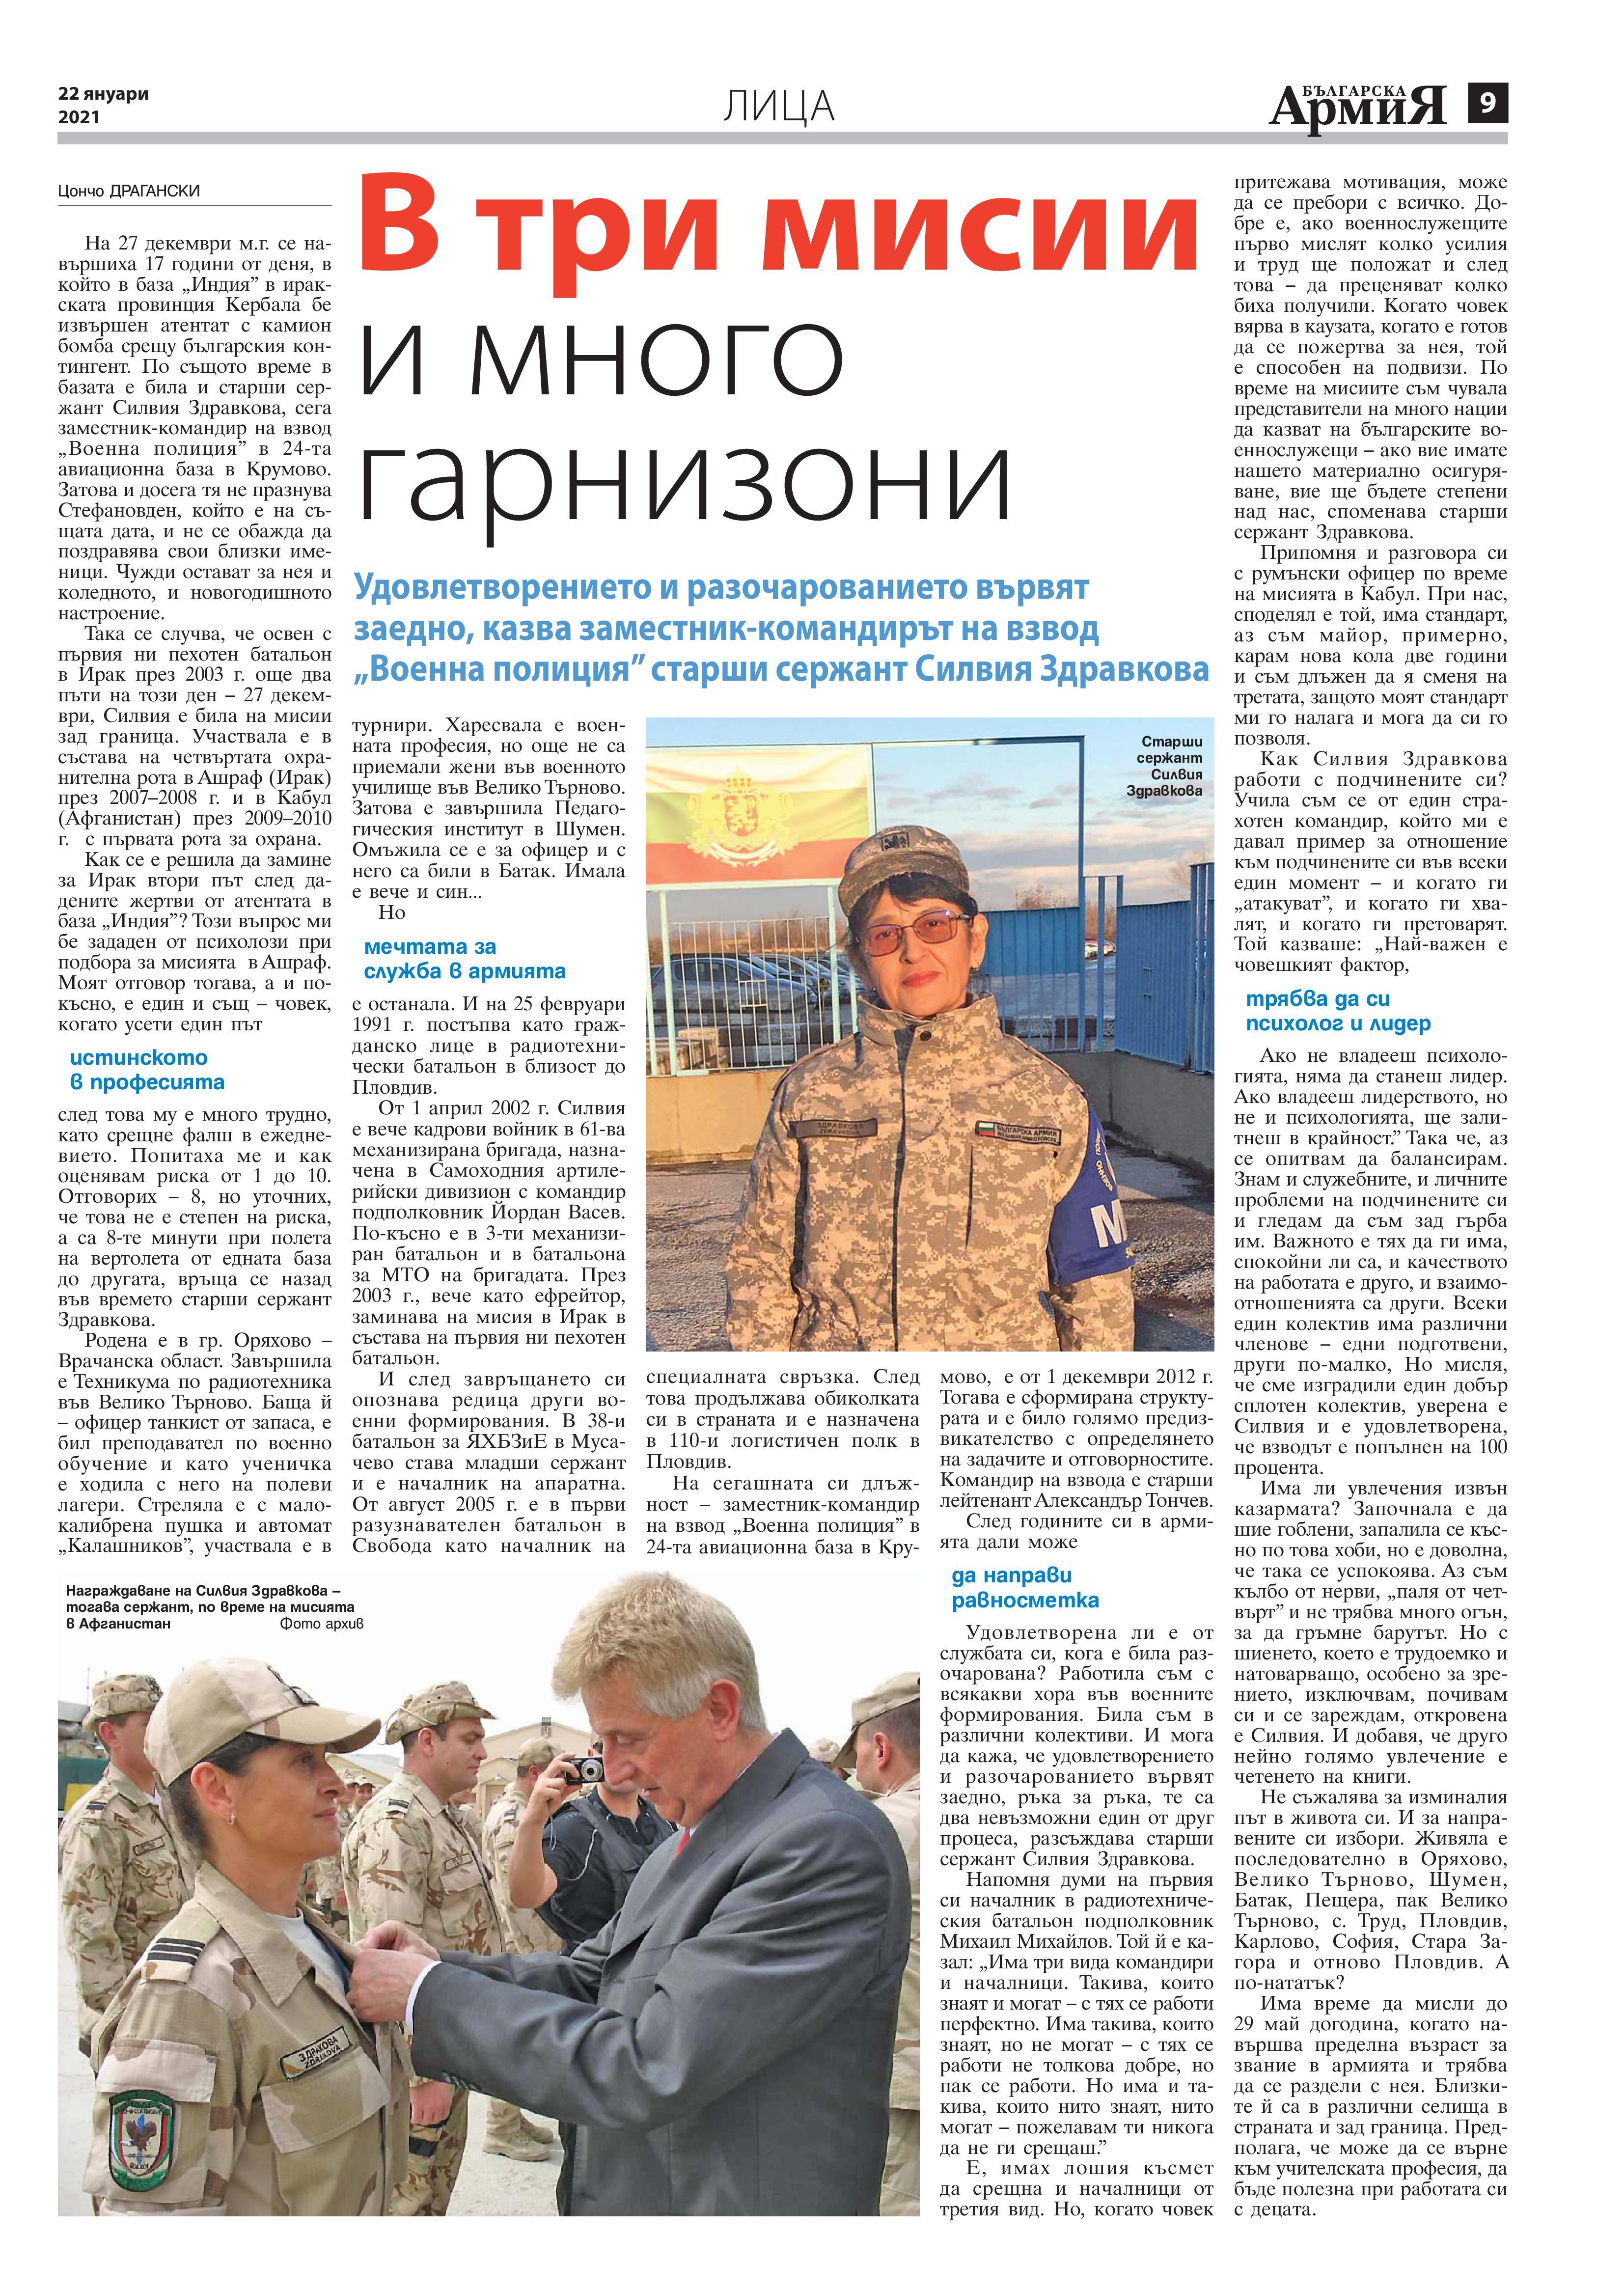 https://www.armymedia.bg/wp-content/uploads/2015/06/09-56.jpg